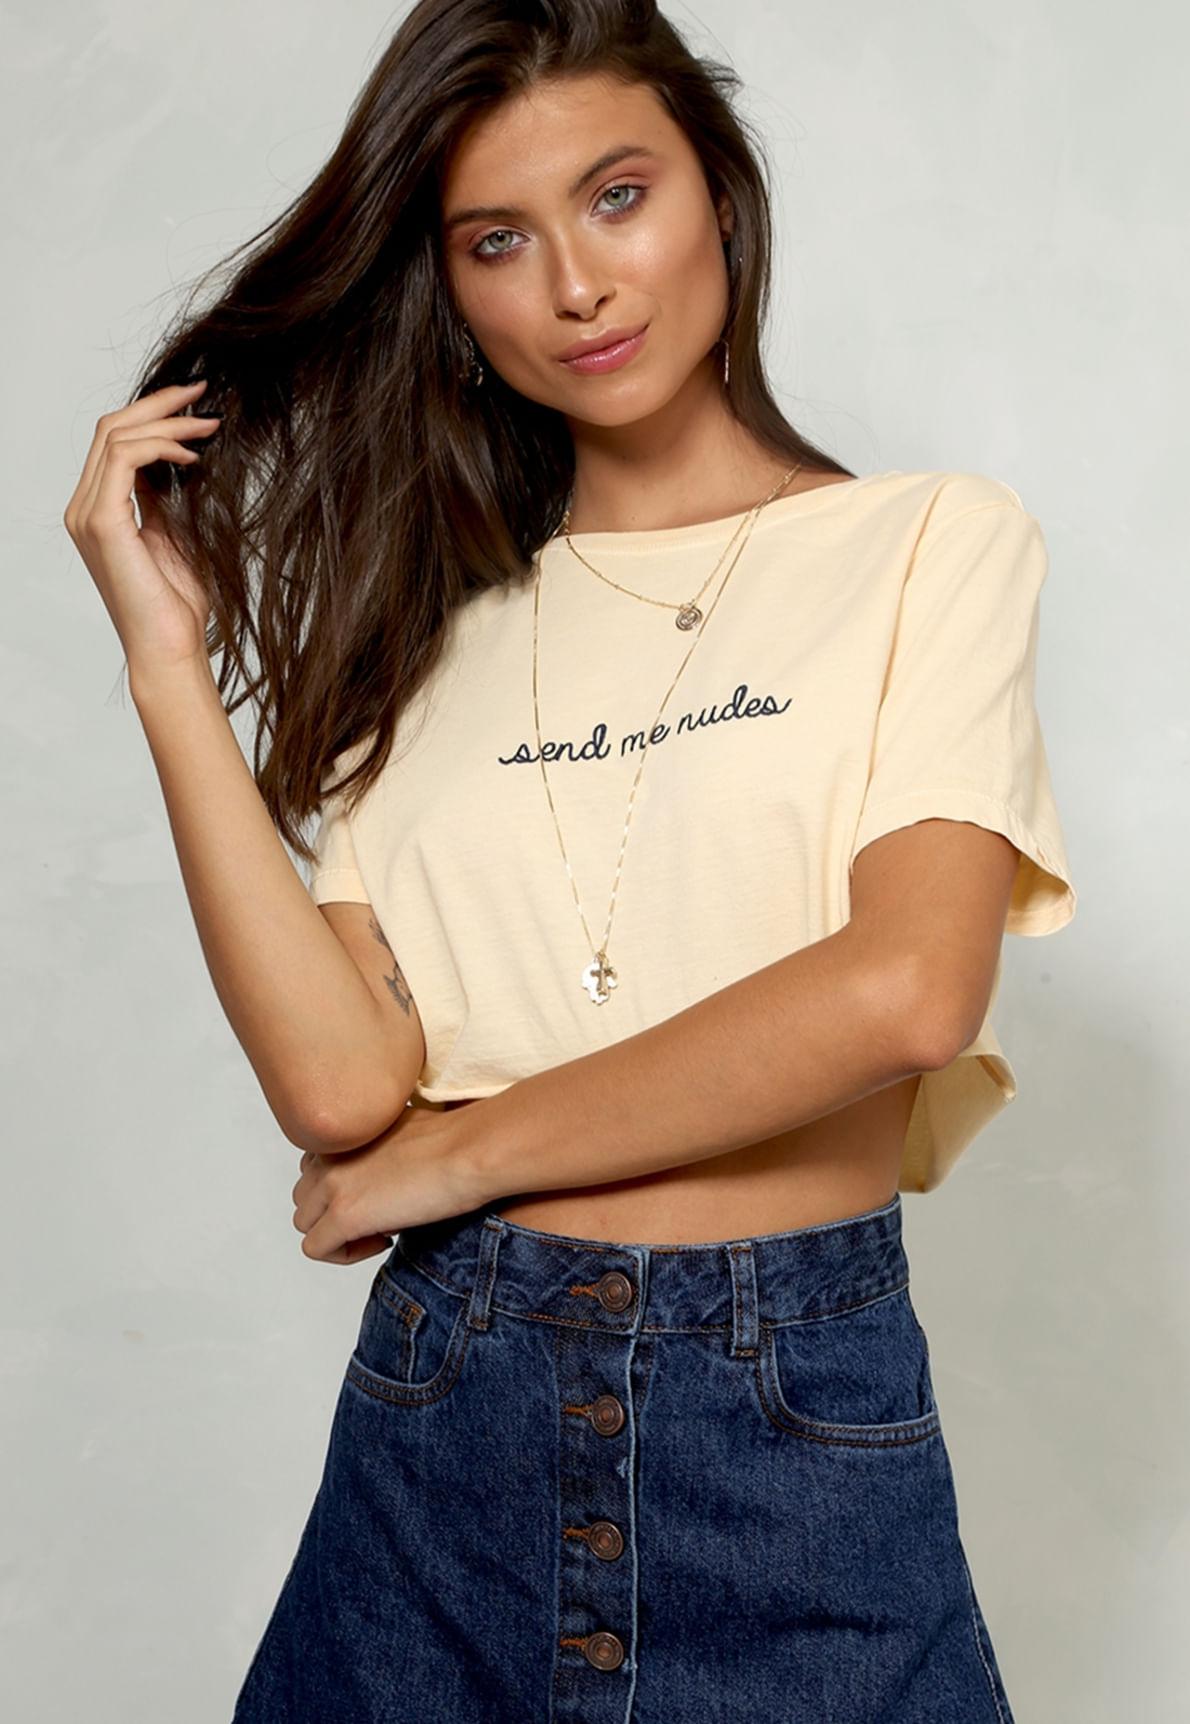 25724-t-shirt-send-me-nudes-mundo-lolita-01